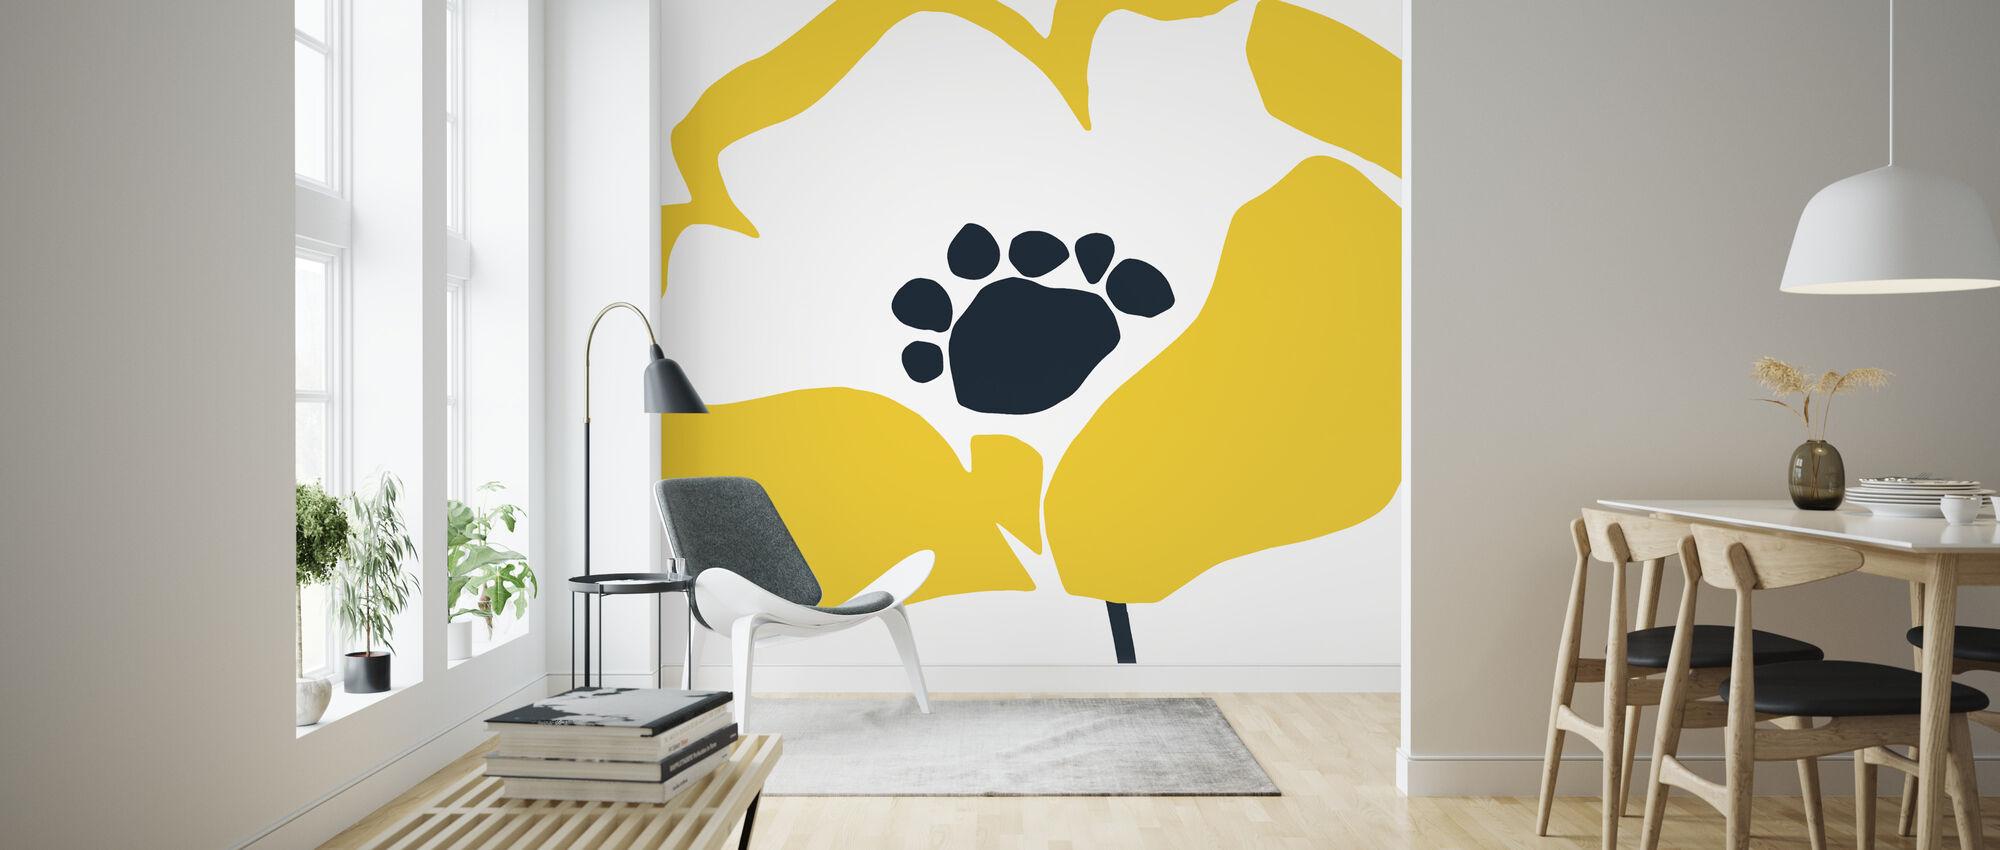 Pop Art Blomstret II - Tapet - Stue